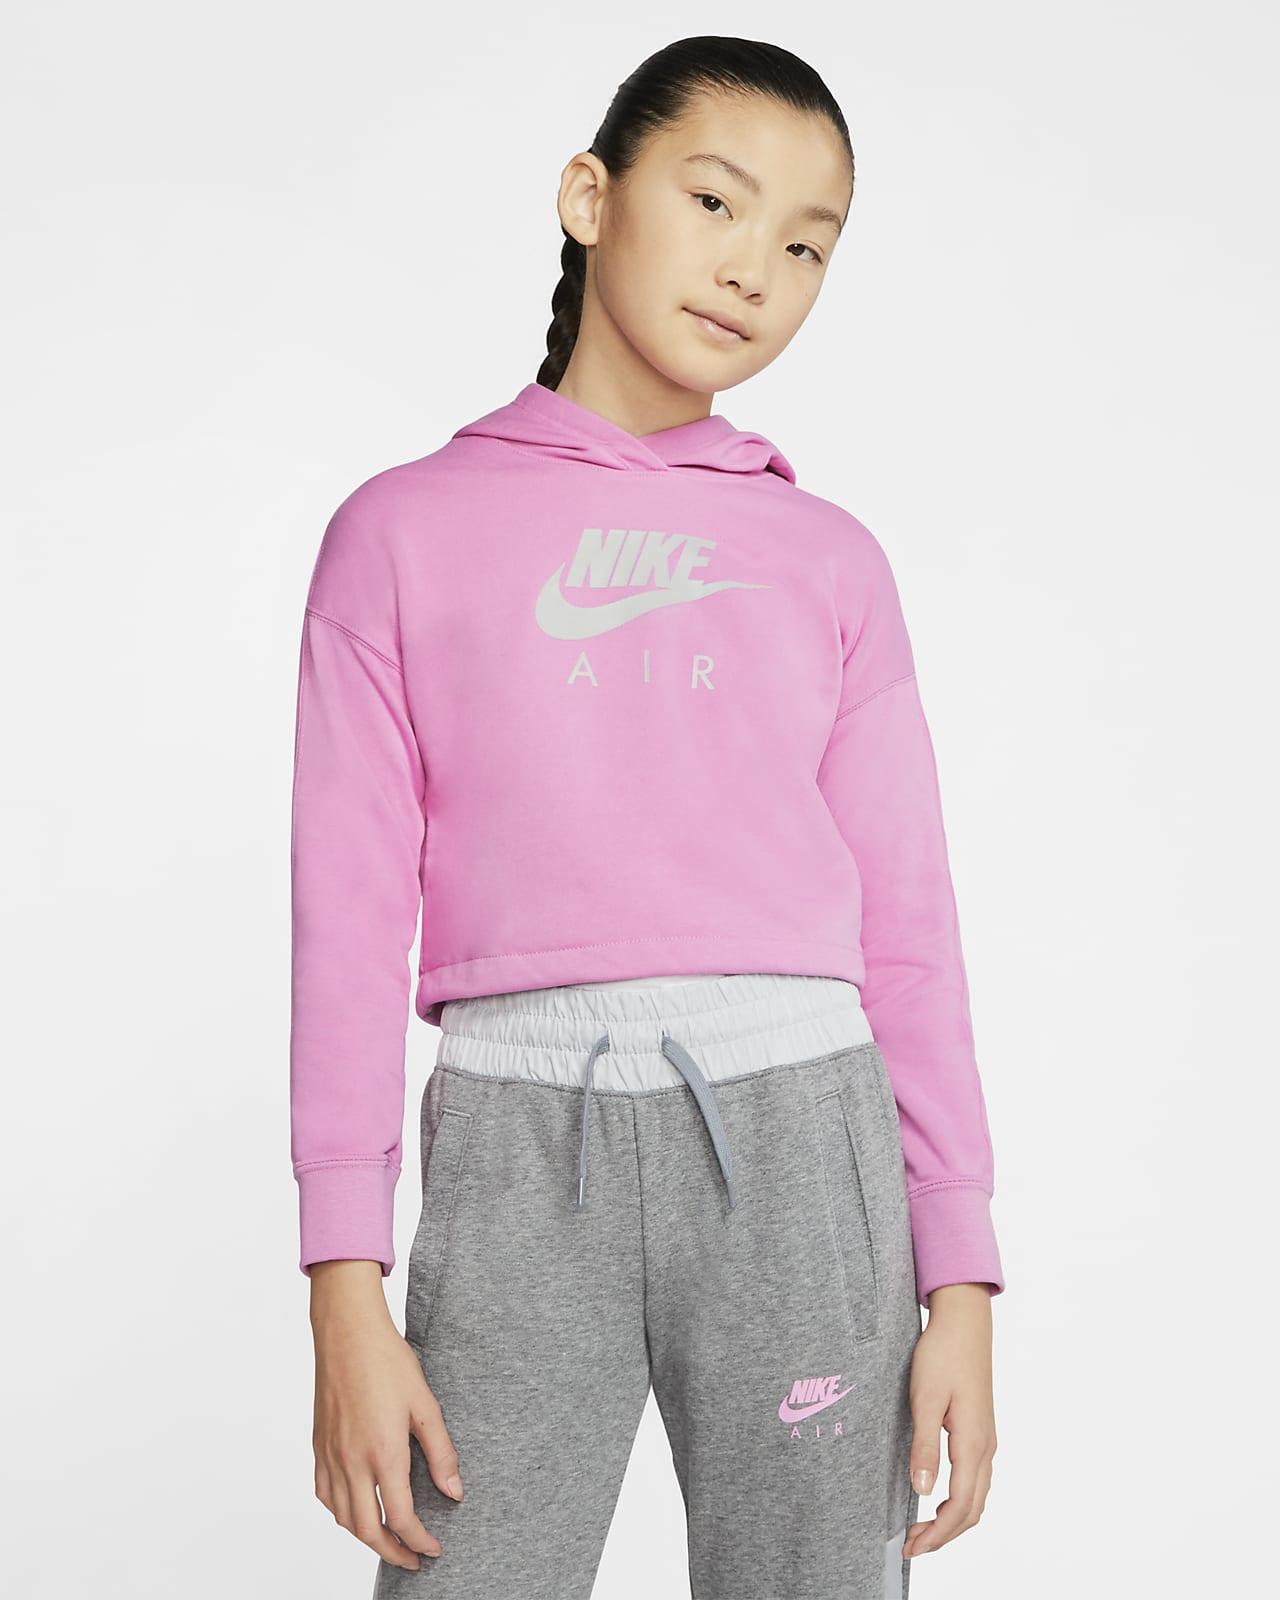 Nike Air Sudadera con capucha corta - Niña